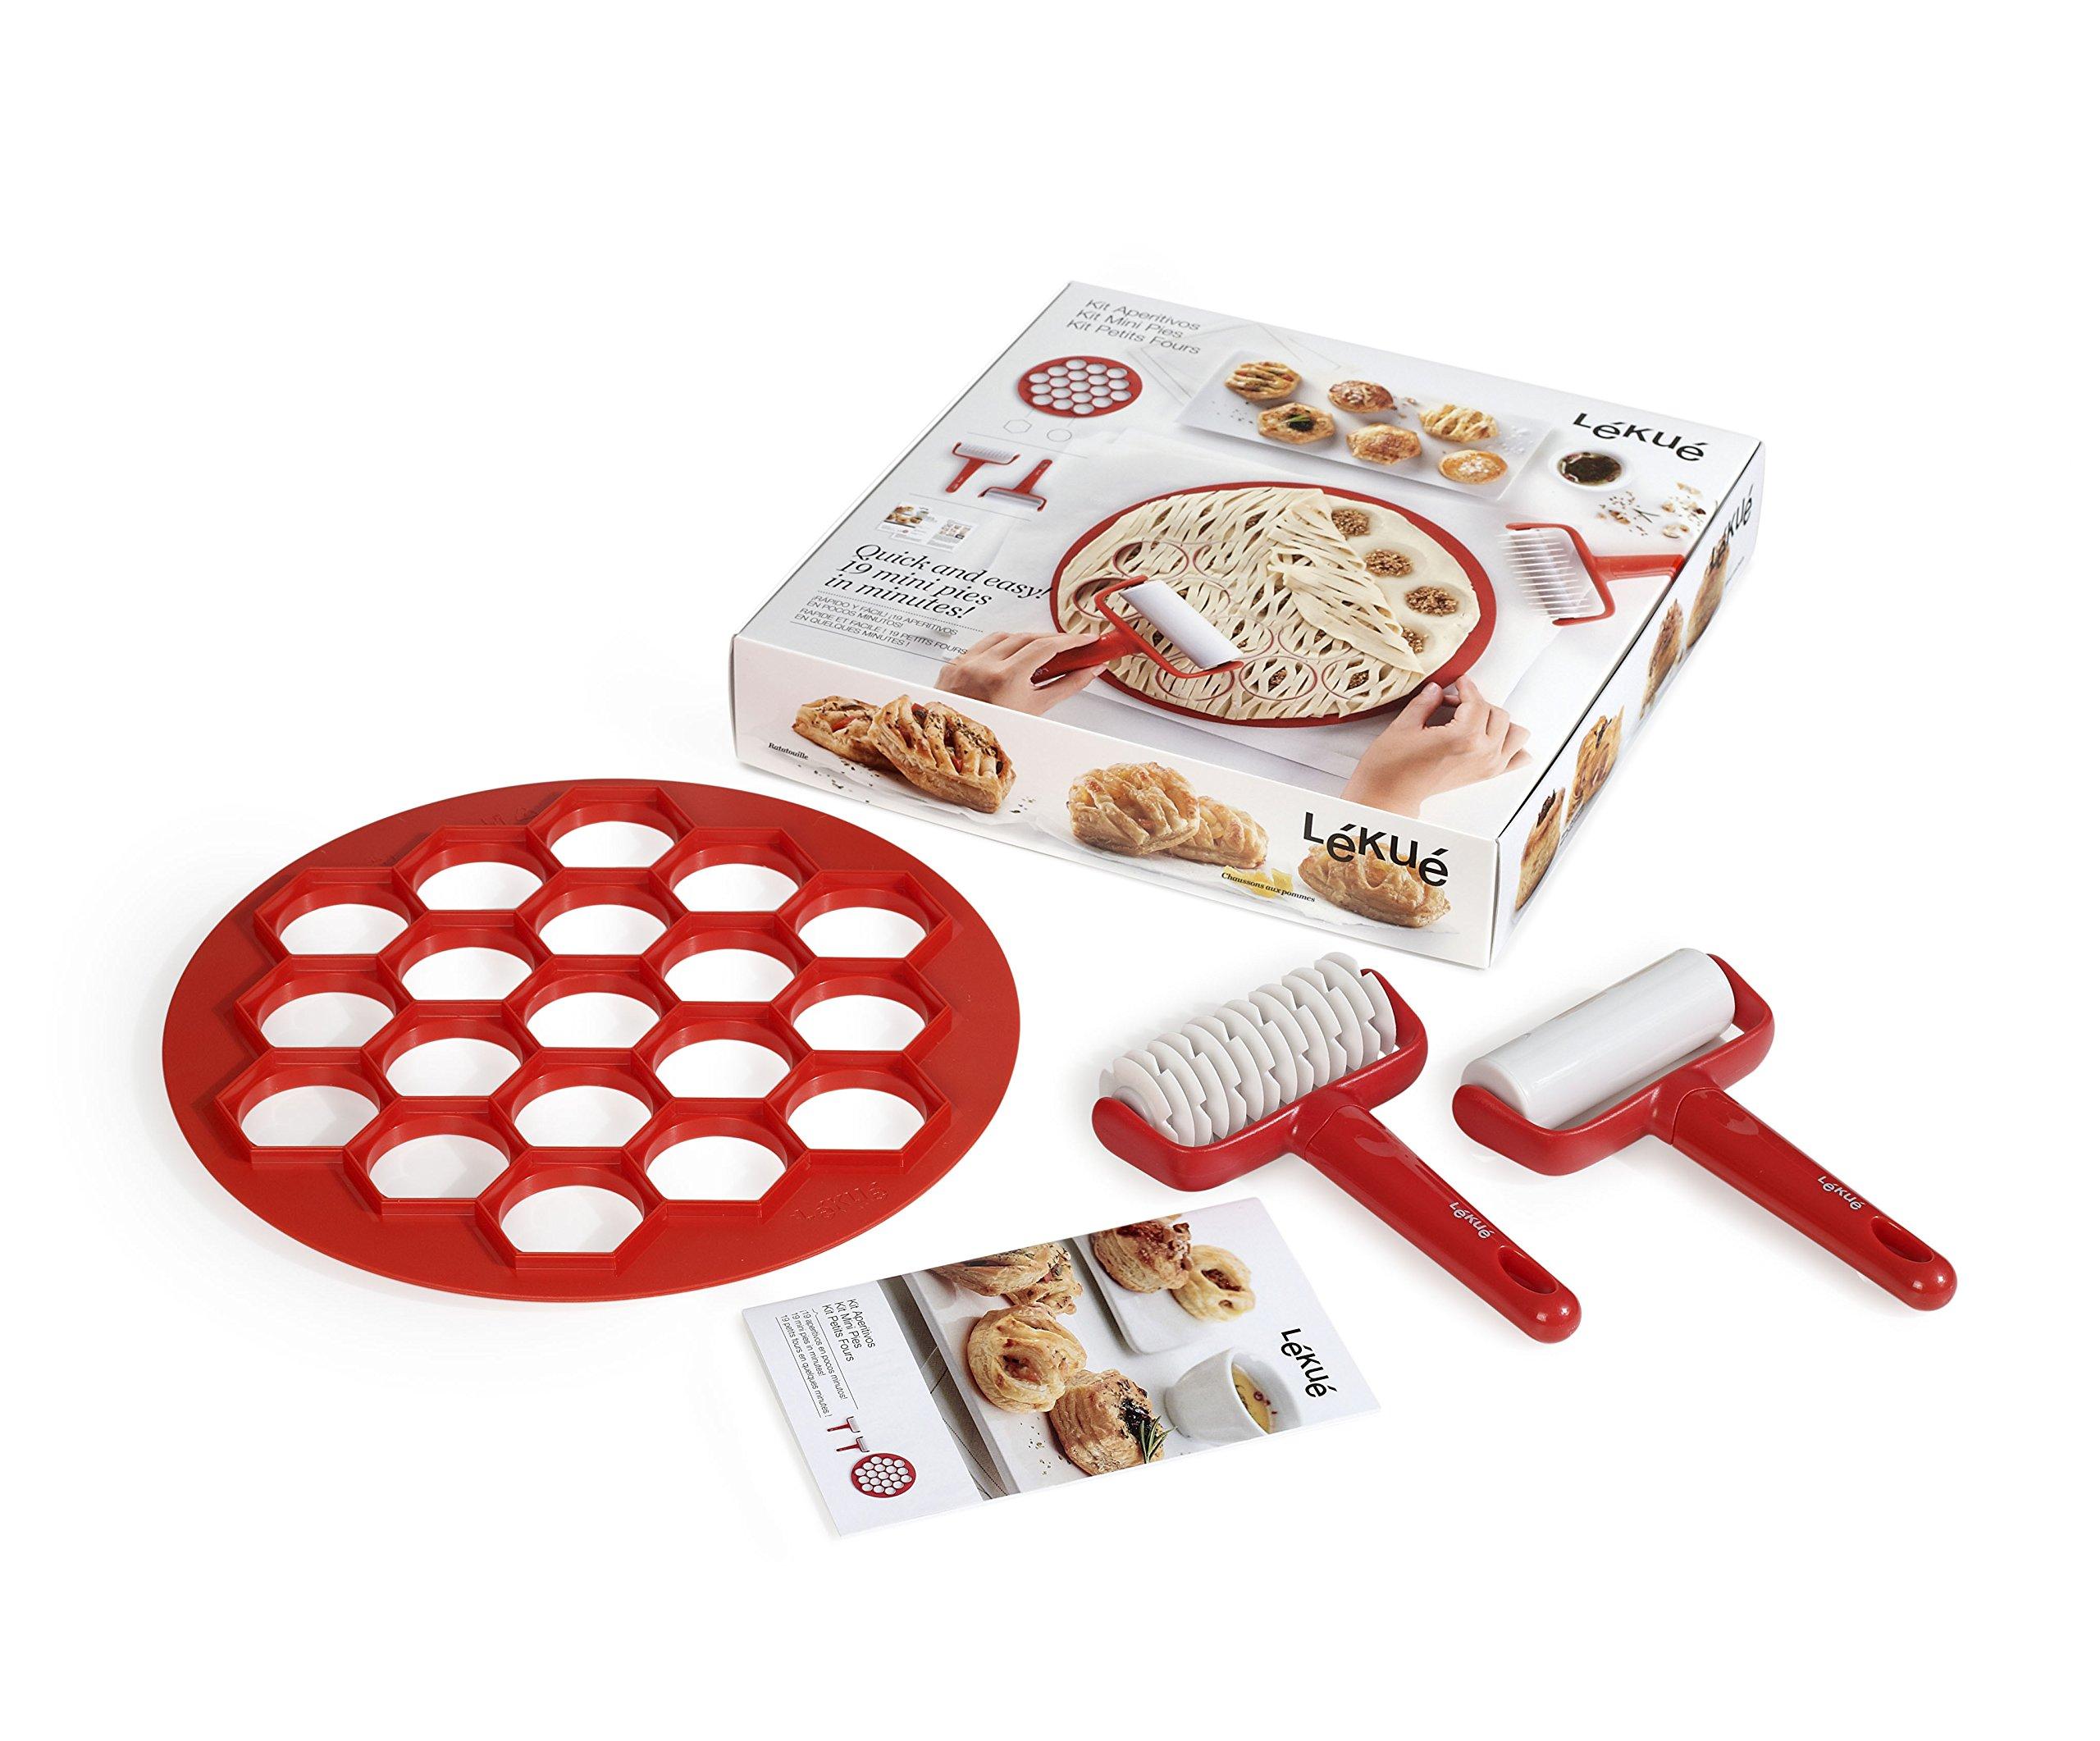 Lekue 0200130SURM017 Mini Pie Kit, Red